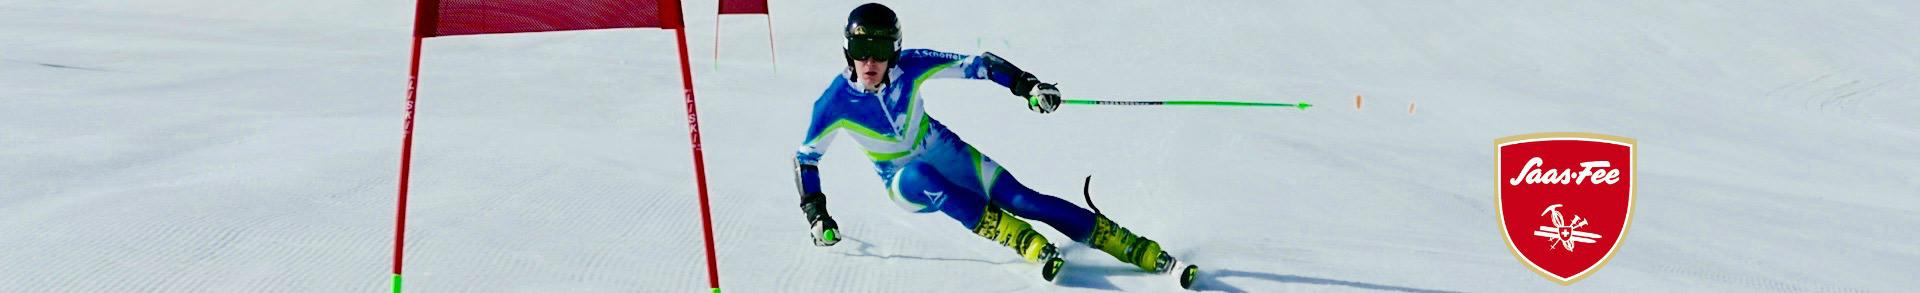 saas-fee summer giant slalom training